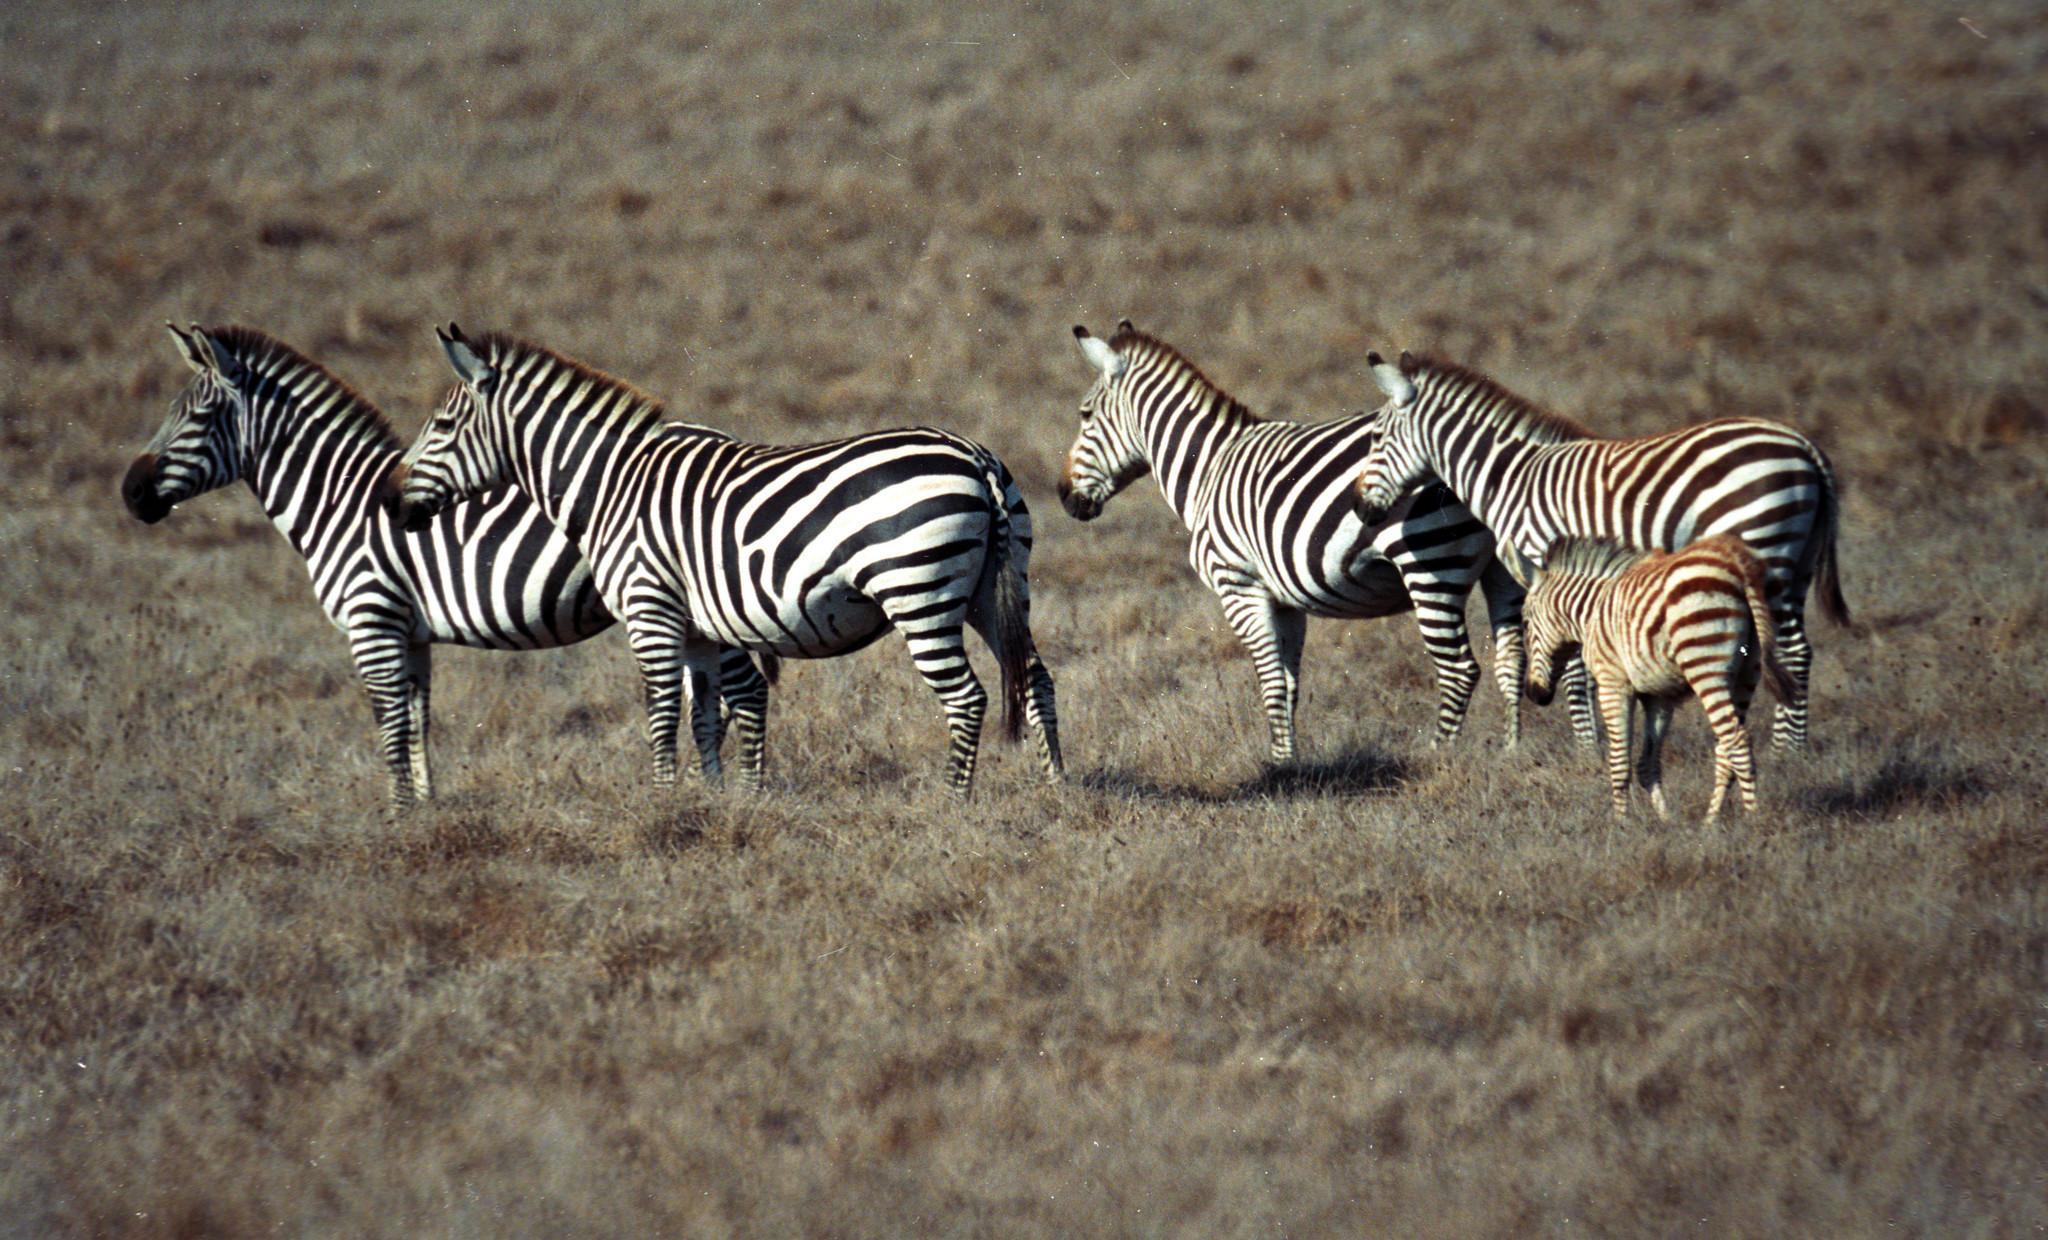 Skinned zebra found dead on beach near Hearst Castle